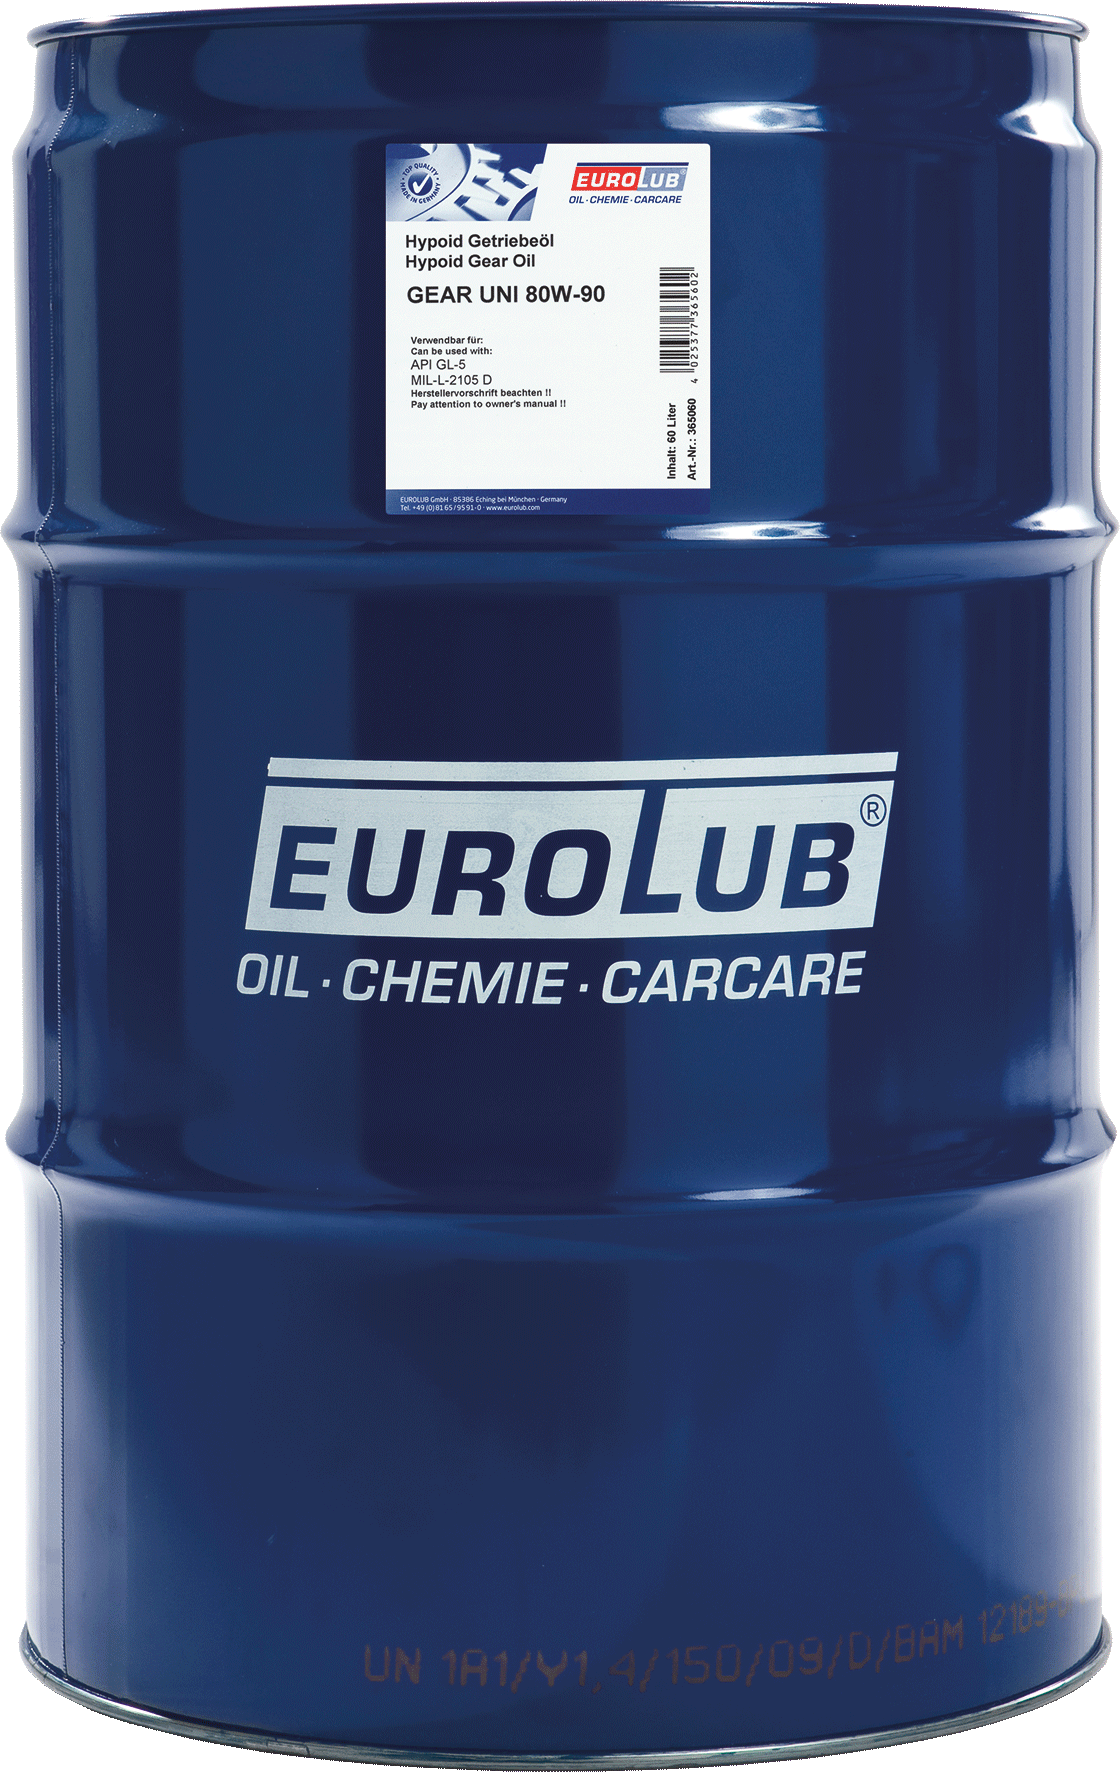 EUROLUB Gear Uni SAE 80W/90 (минеральное), 60л